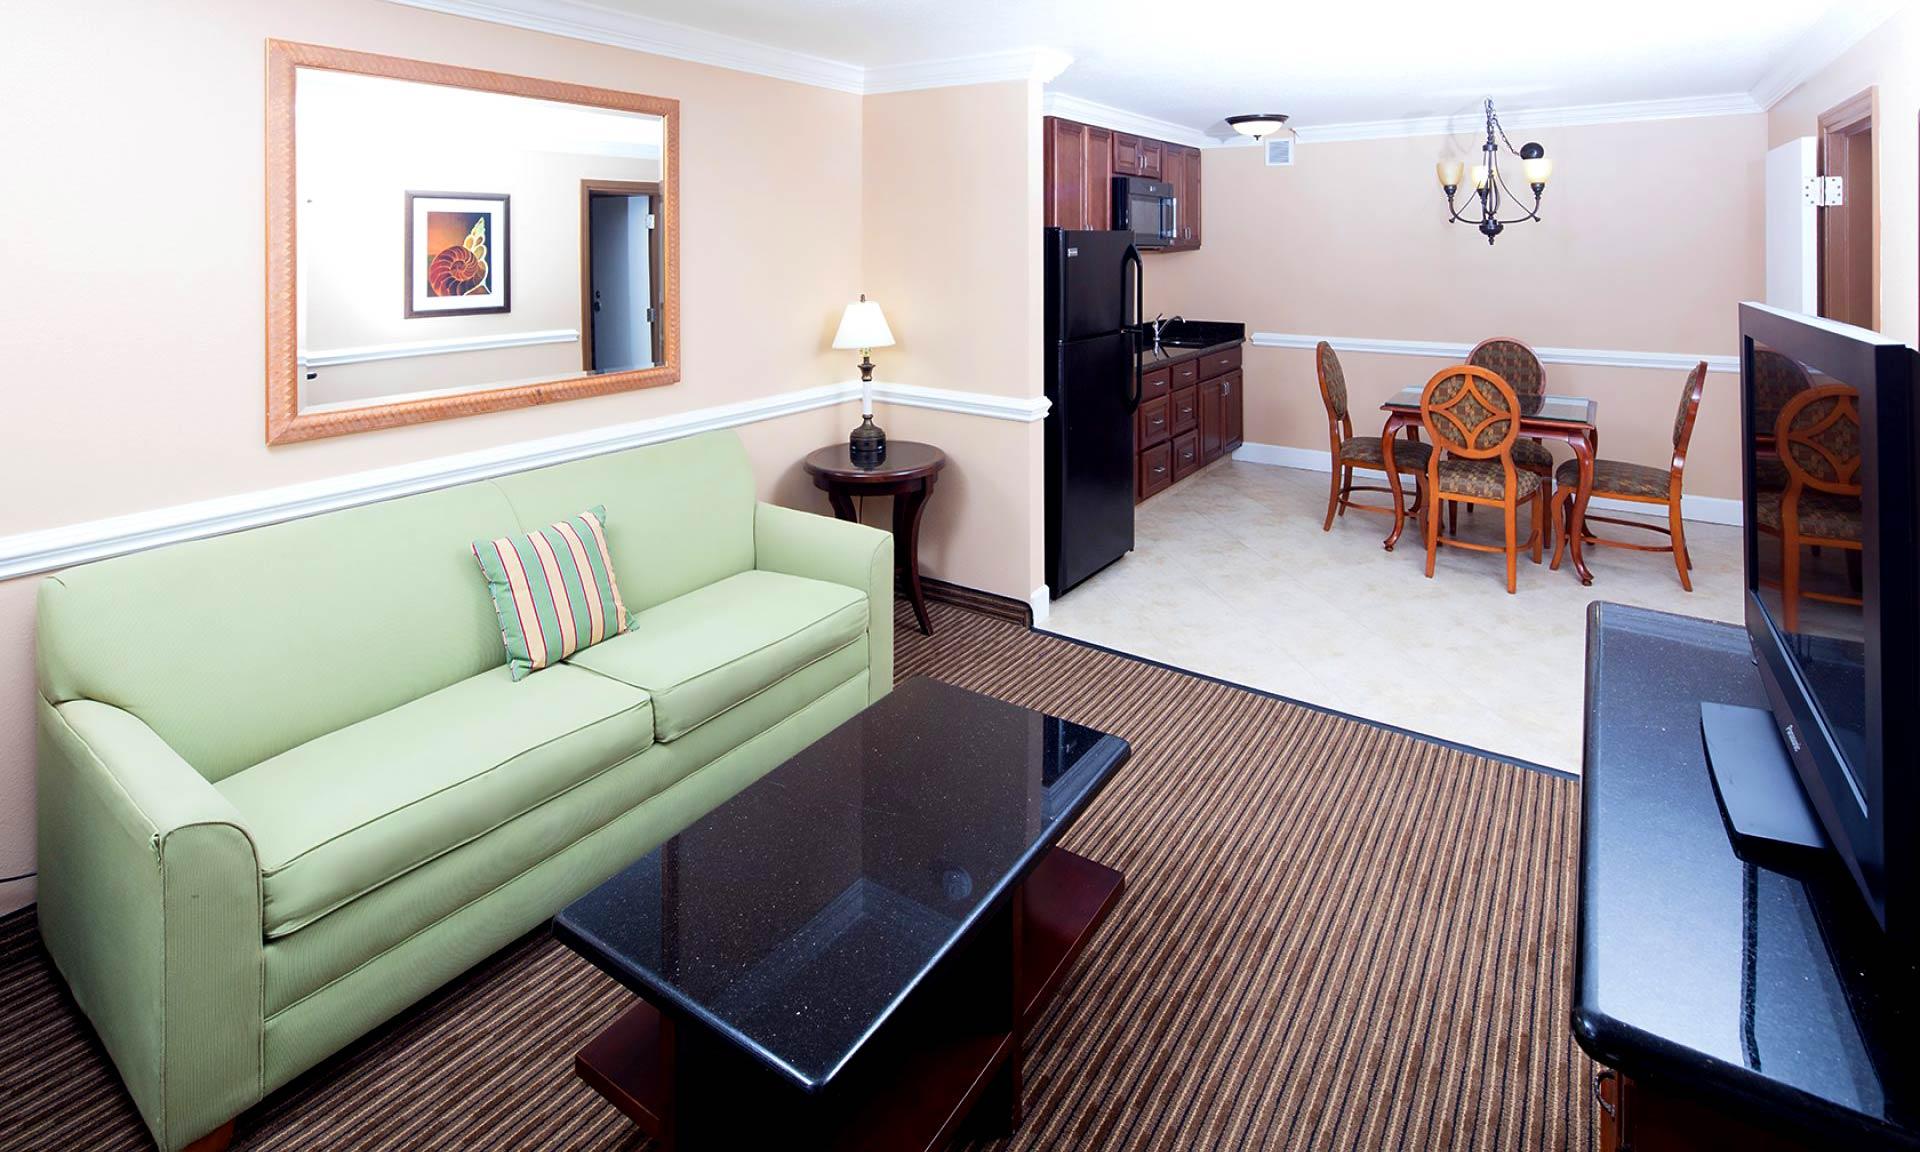 Red_Lion_Hotel_Orlando_KissimmeeMaingate_Guestroom_04